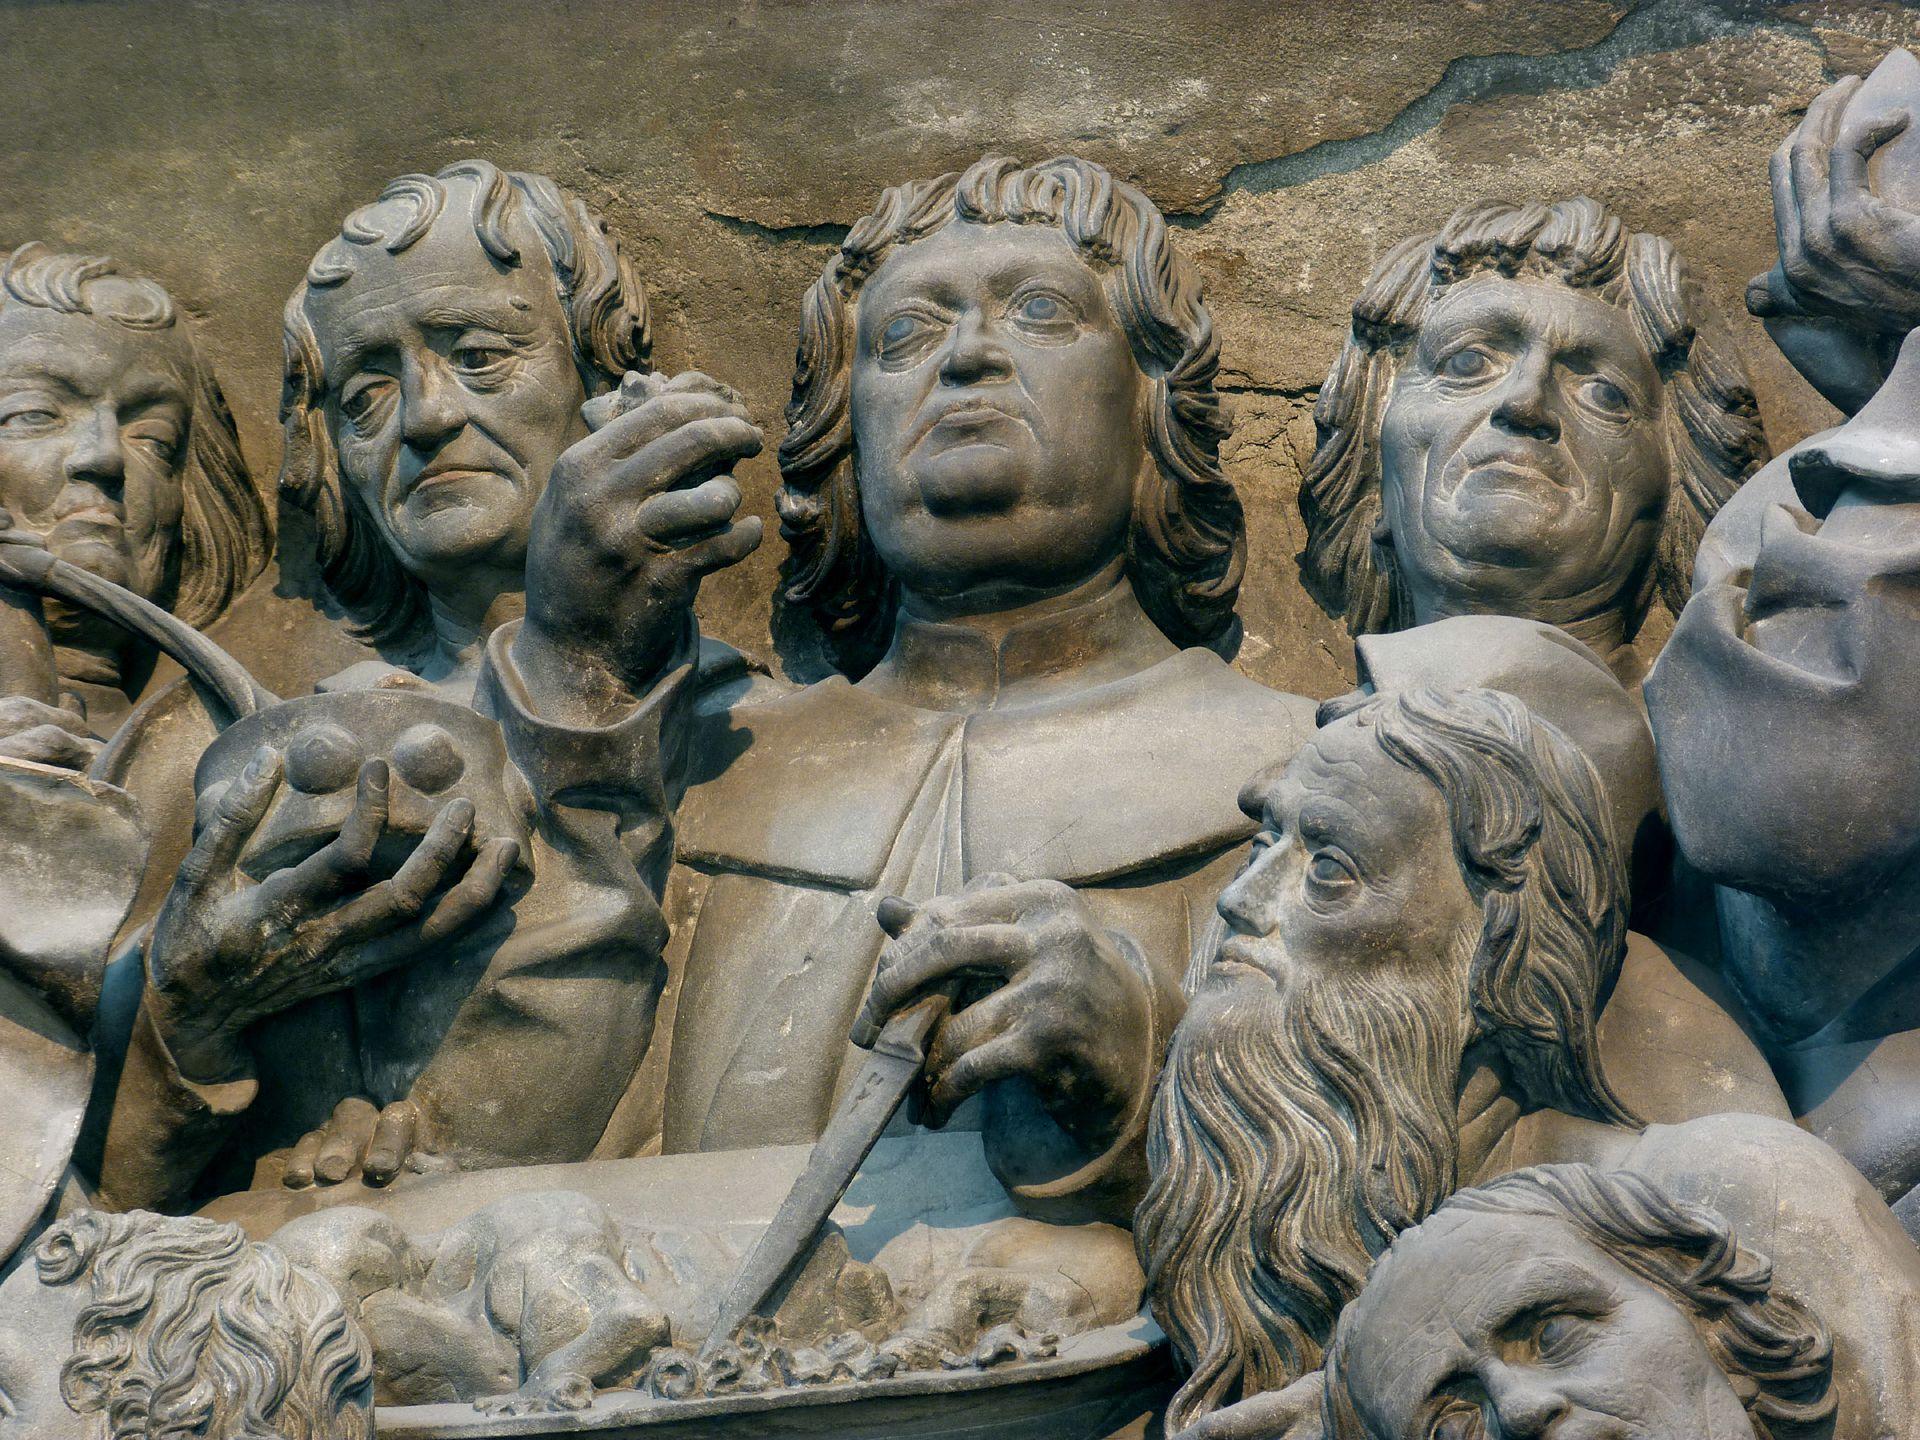 Volckamersche Gedächtsnisstiftung, Reliefplatten Letztes Abendmahl, Detail: Apostelgruppe um das Passahlamm